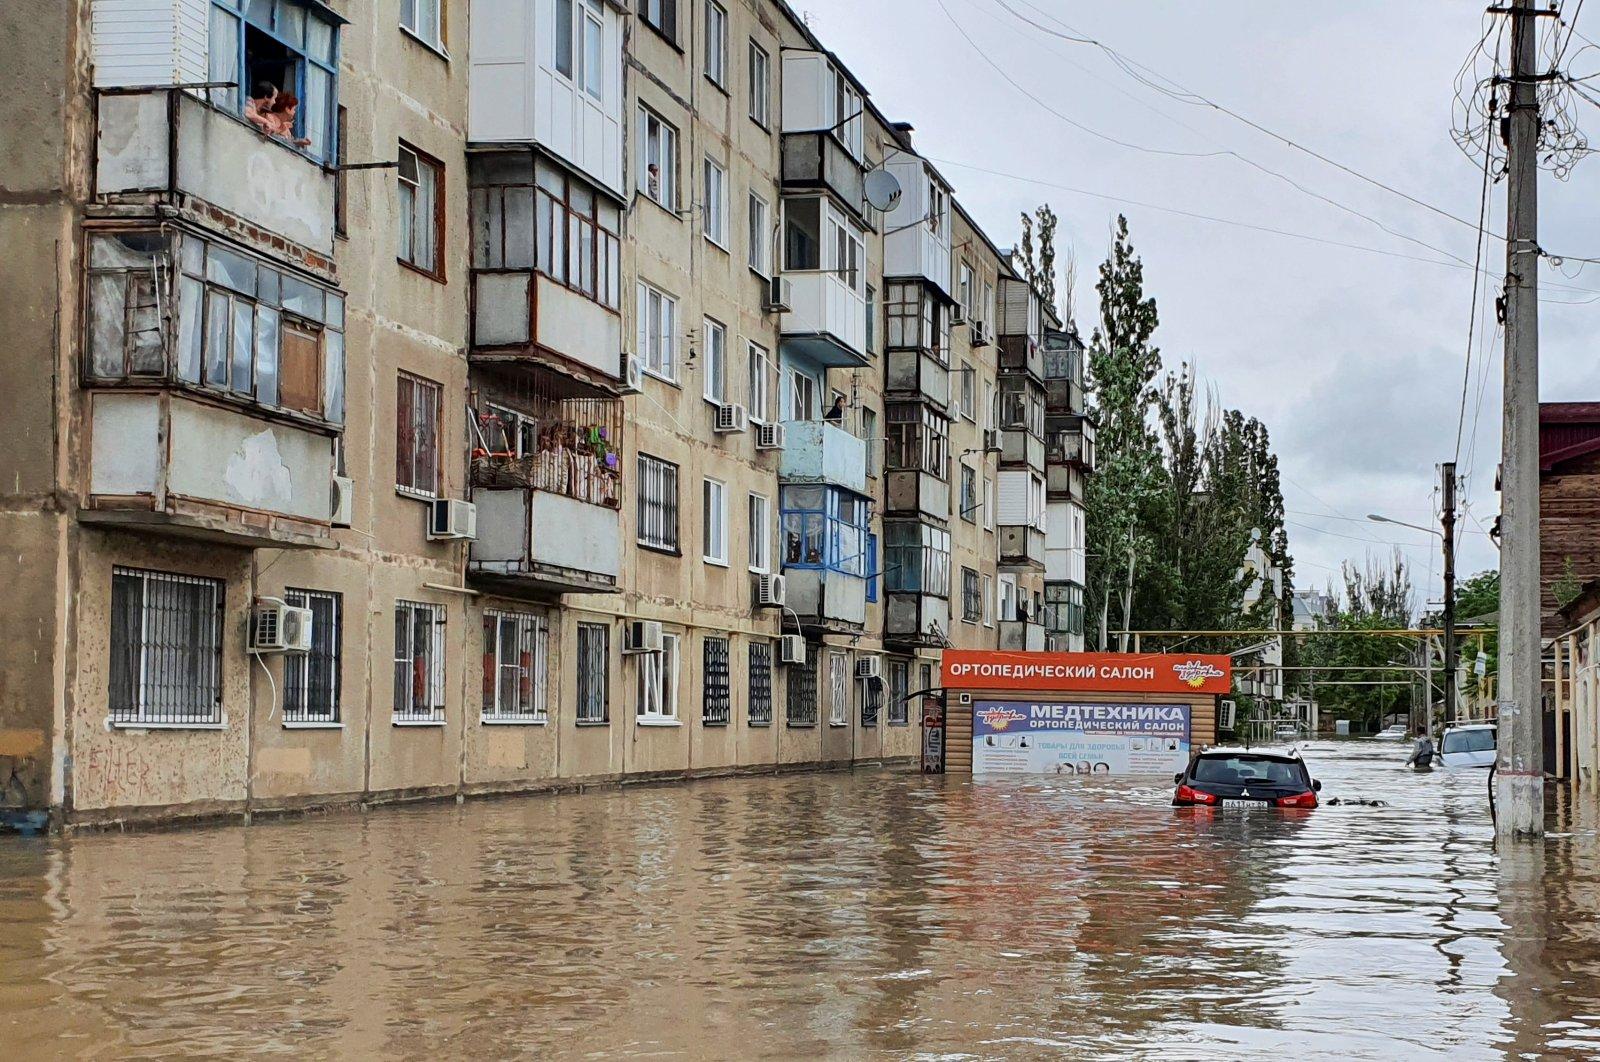 A view shows a flooded street following heavy rainfall in Kerch, Crimea, Ukraine, June 17, 2021. (Reuters Photo)